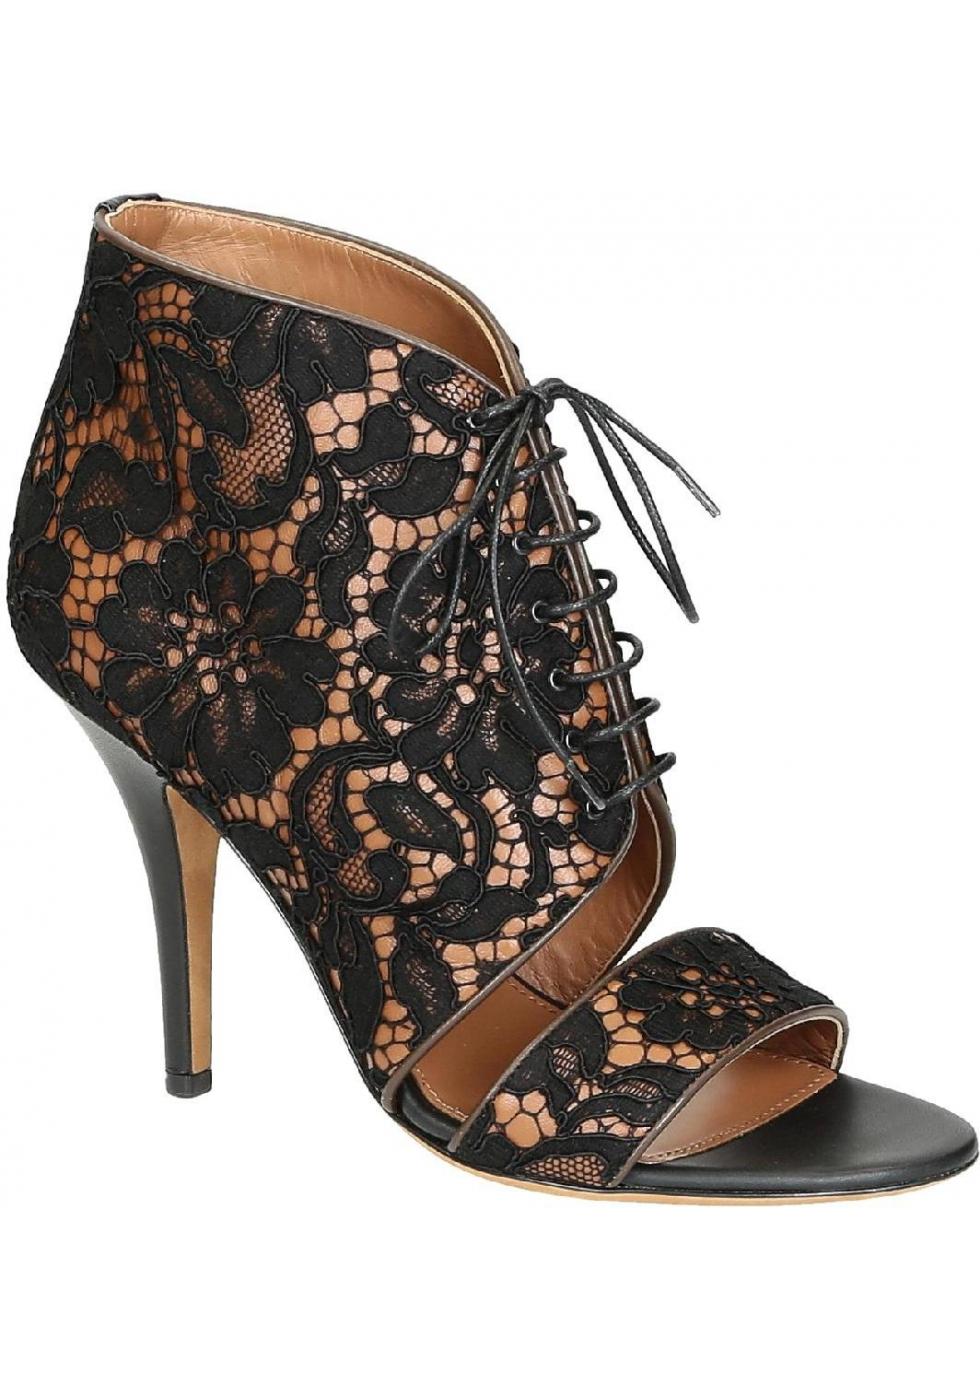 Outlet scarpe Givenchy originali - Italian Boutique ae260edc734